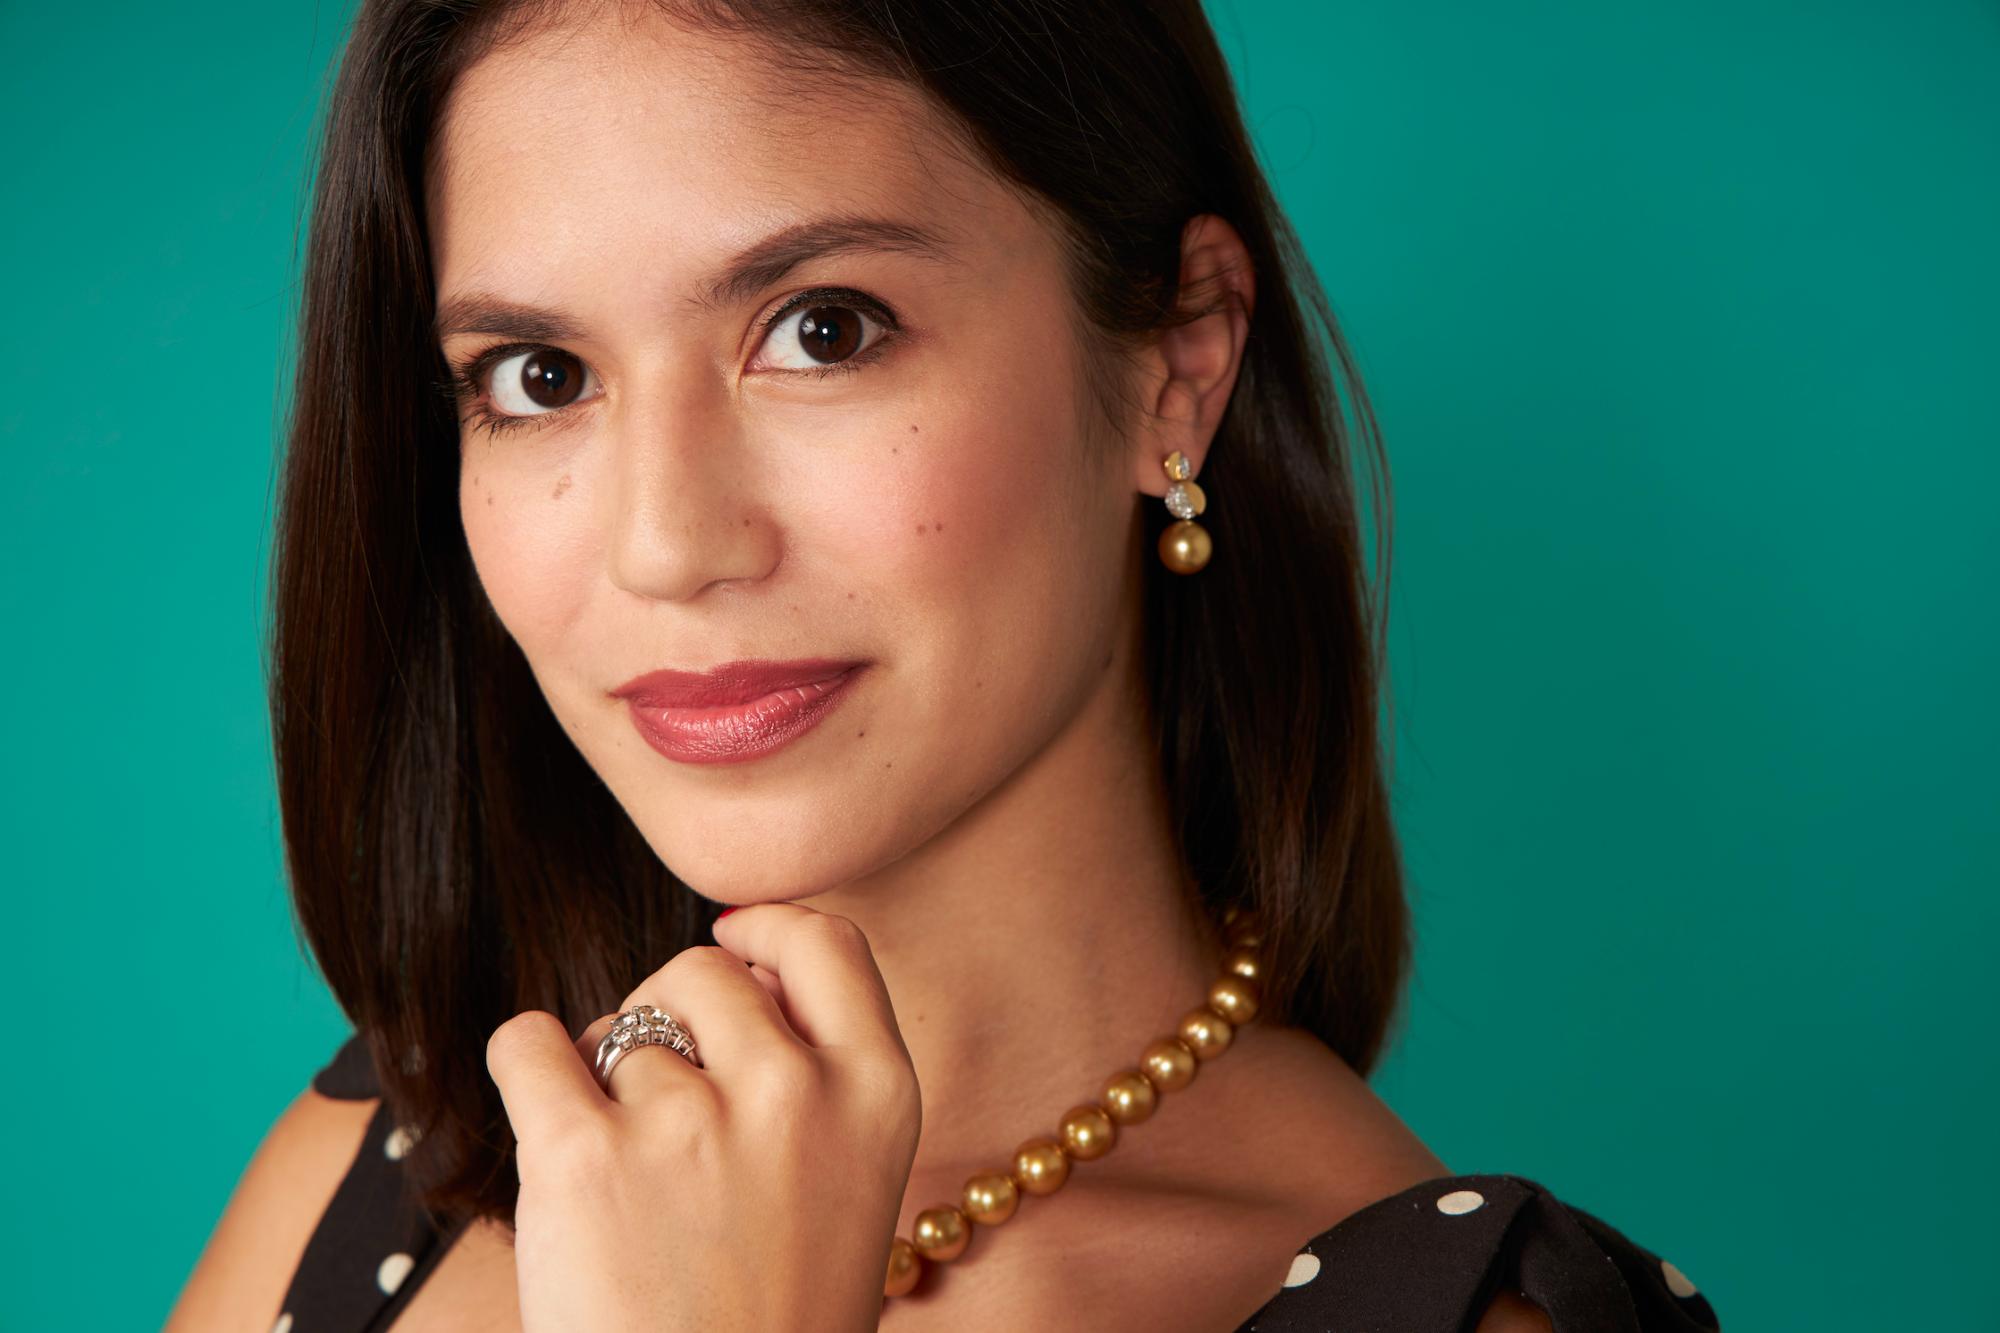 How To Run A Family Business: Jewelmer's Marion Branellec De Guzman Speaks To Tatler